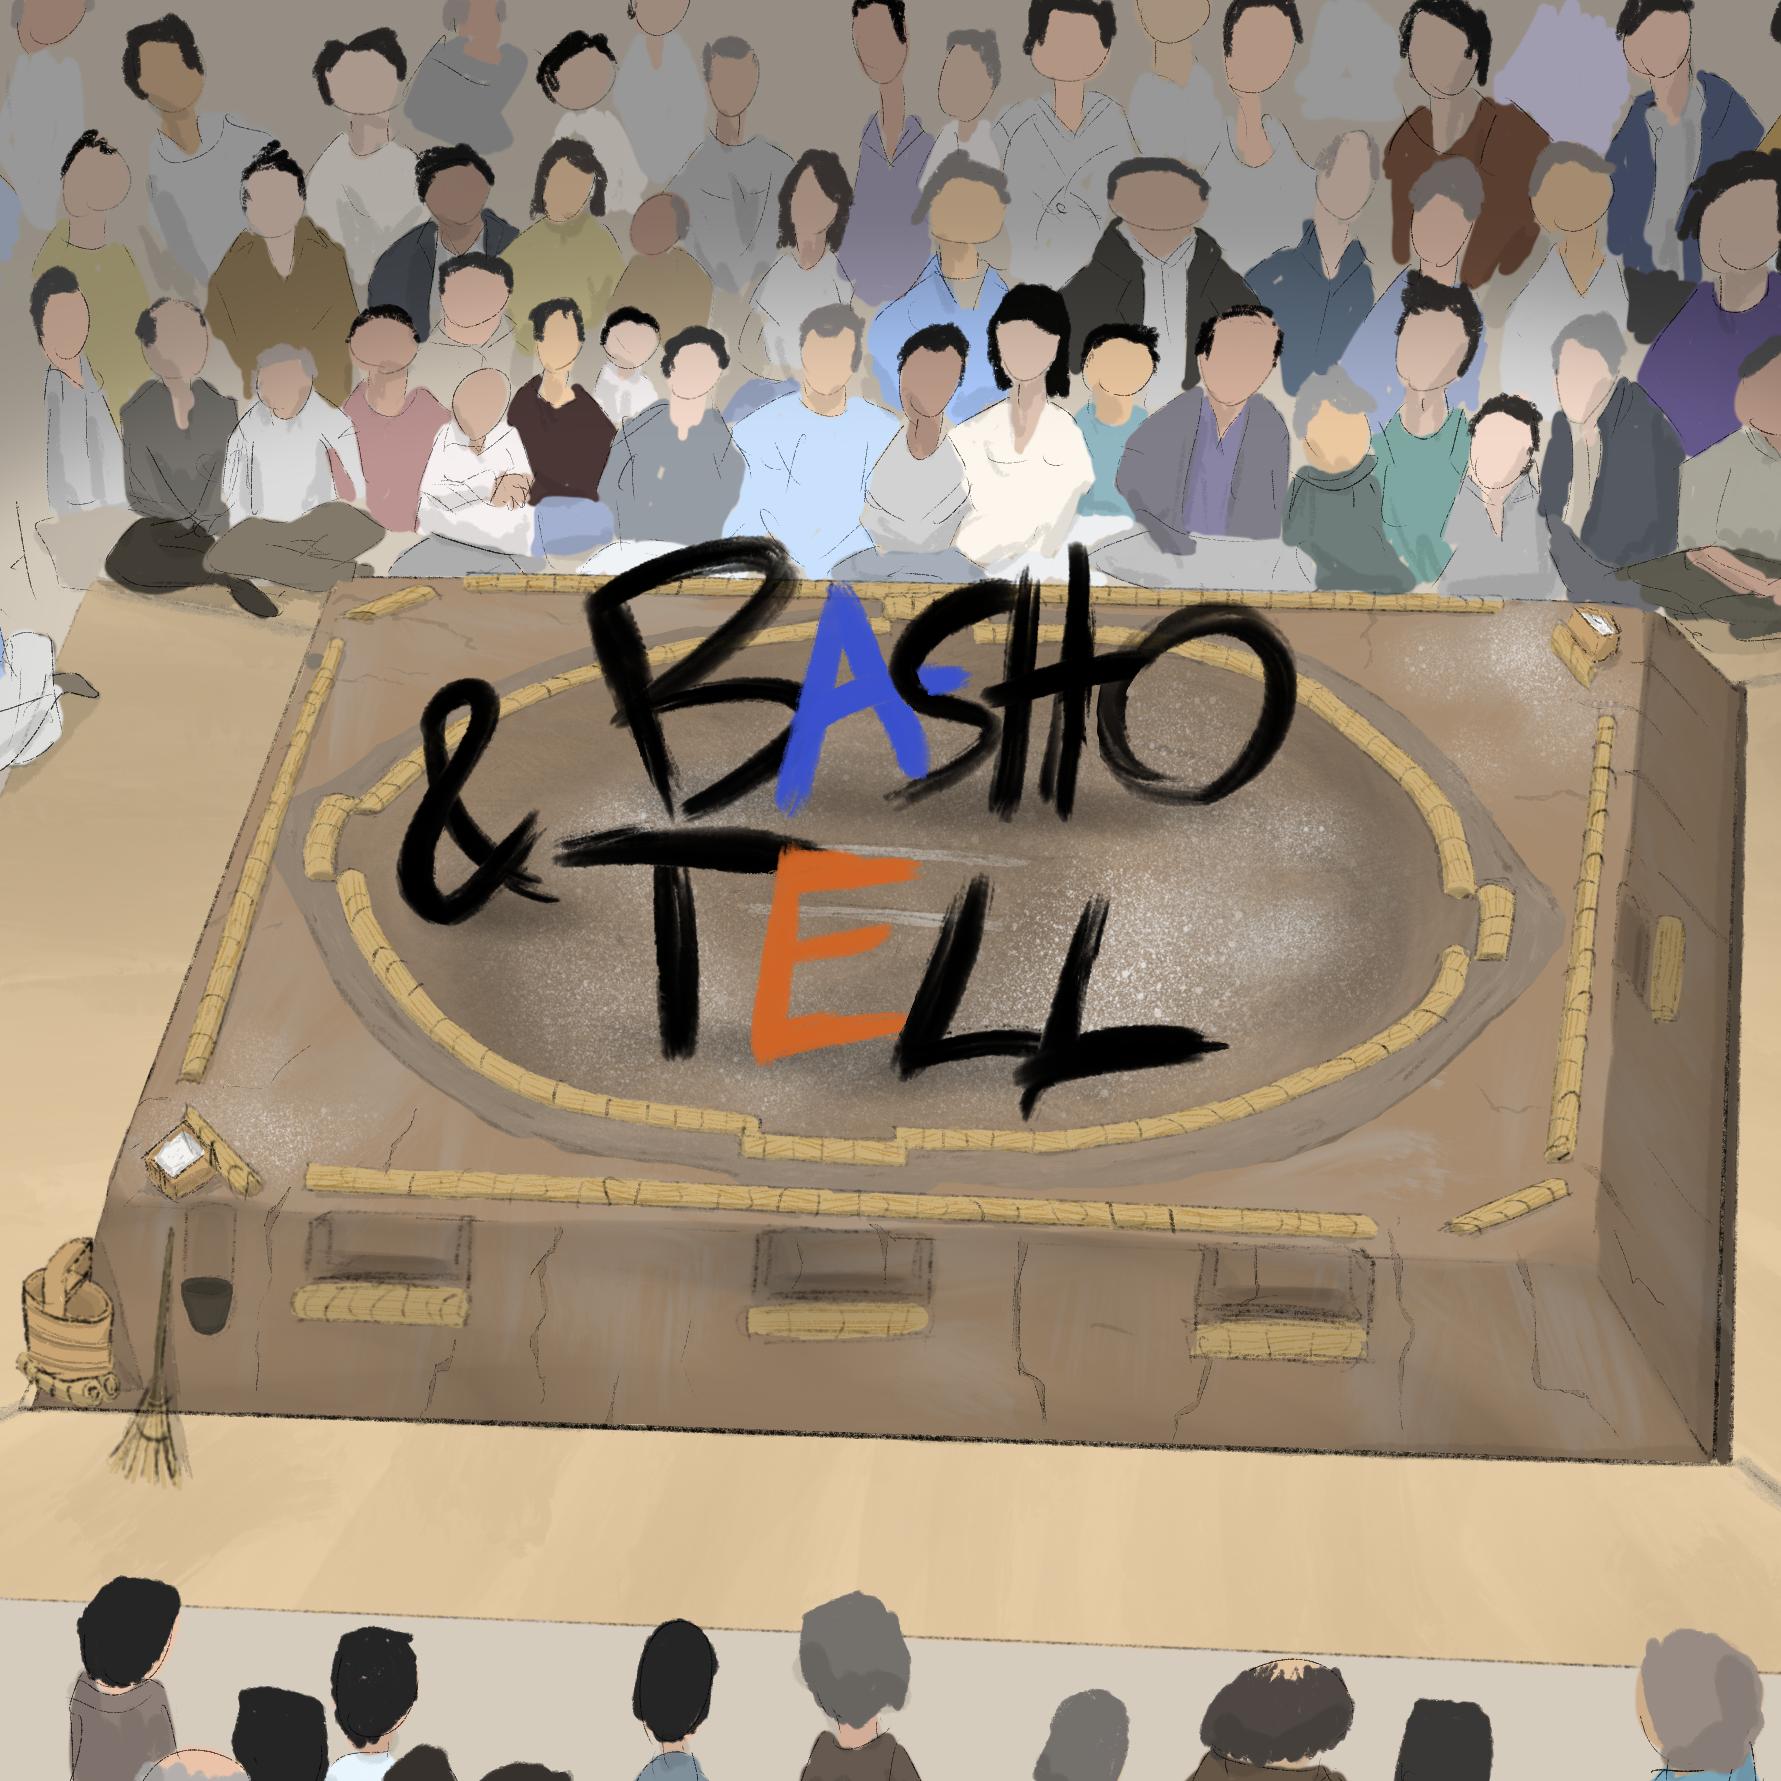 basho__tell.png